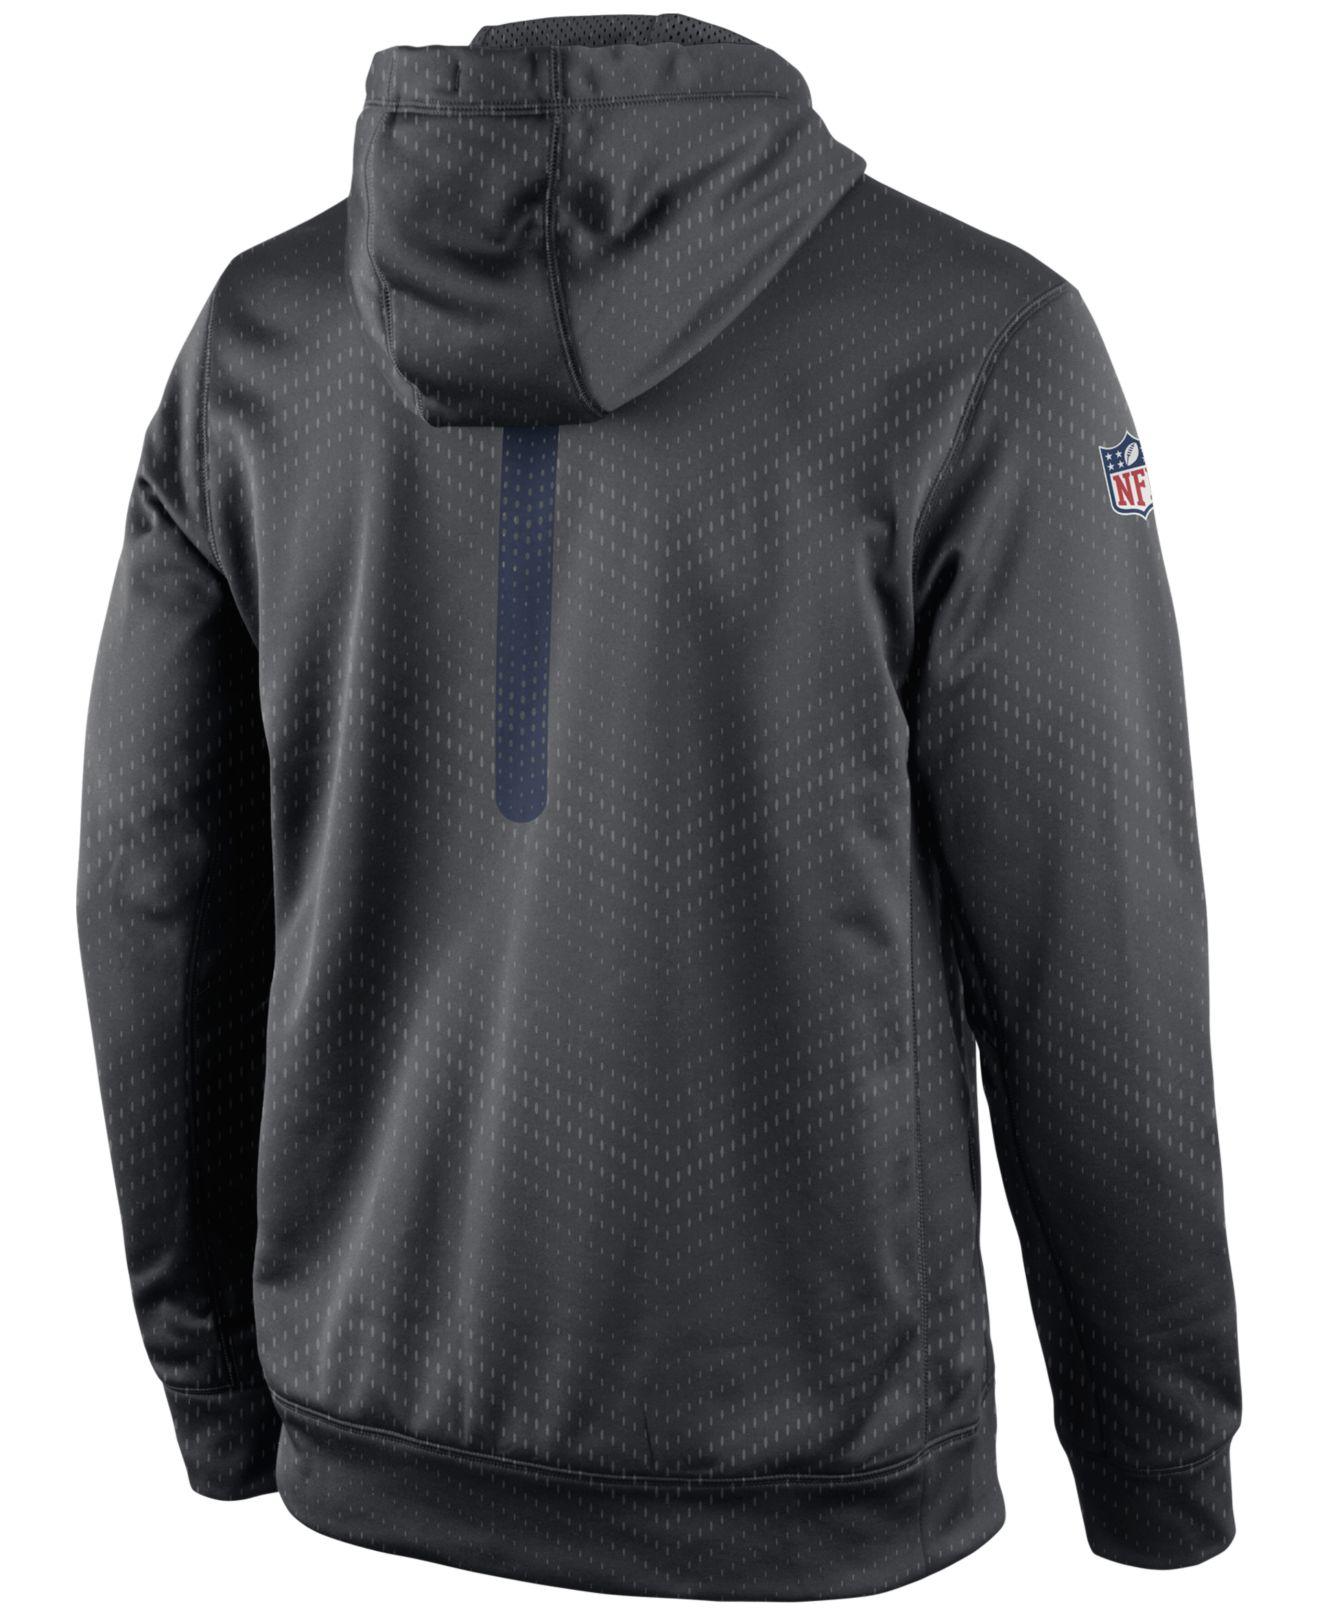 San Diego Chargers Fleece: Nike Men's San Diego Chargers Sideline Ko Fleece Hoodie In